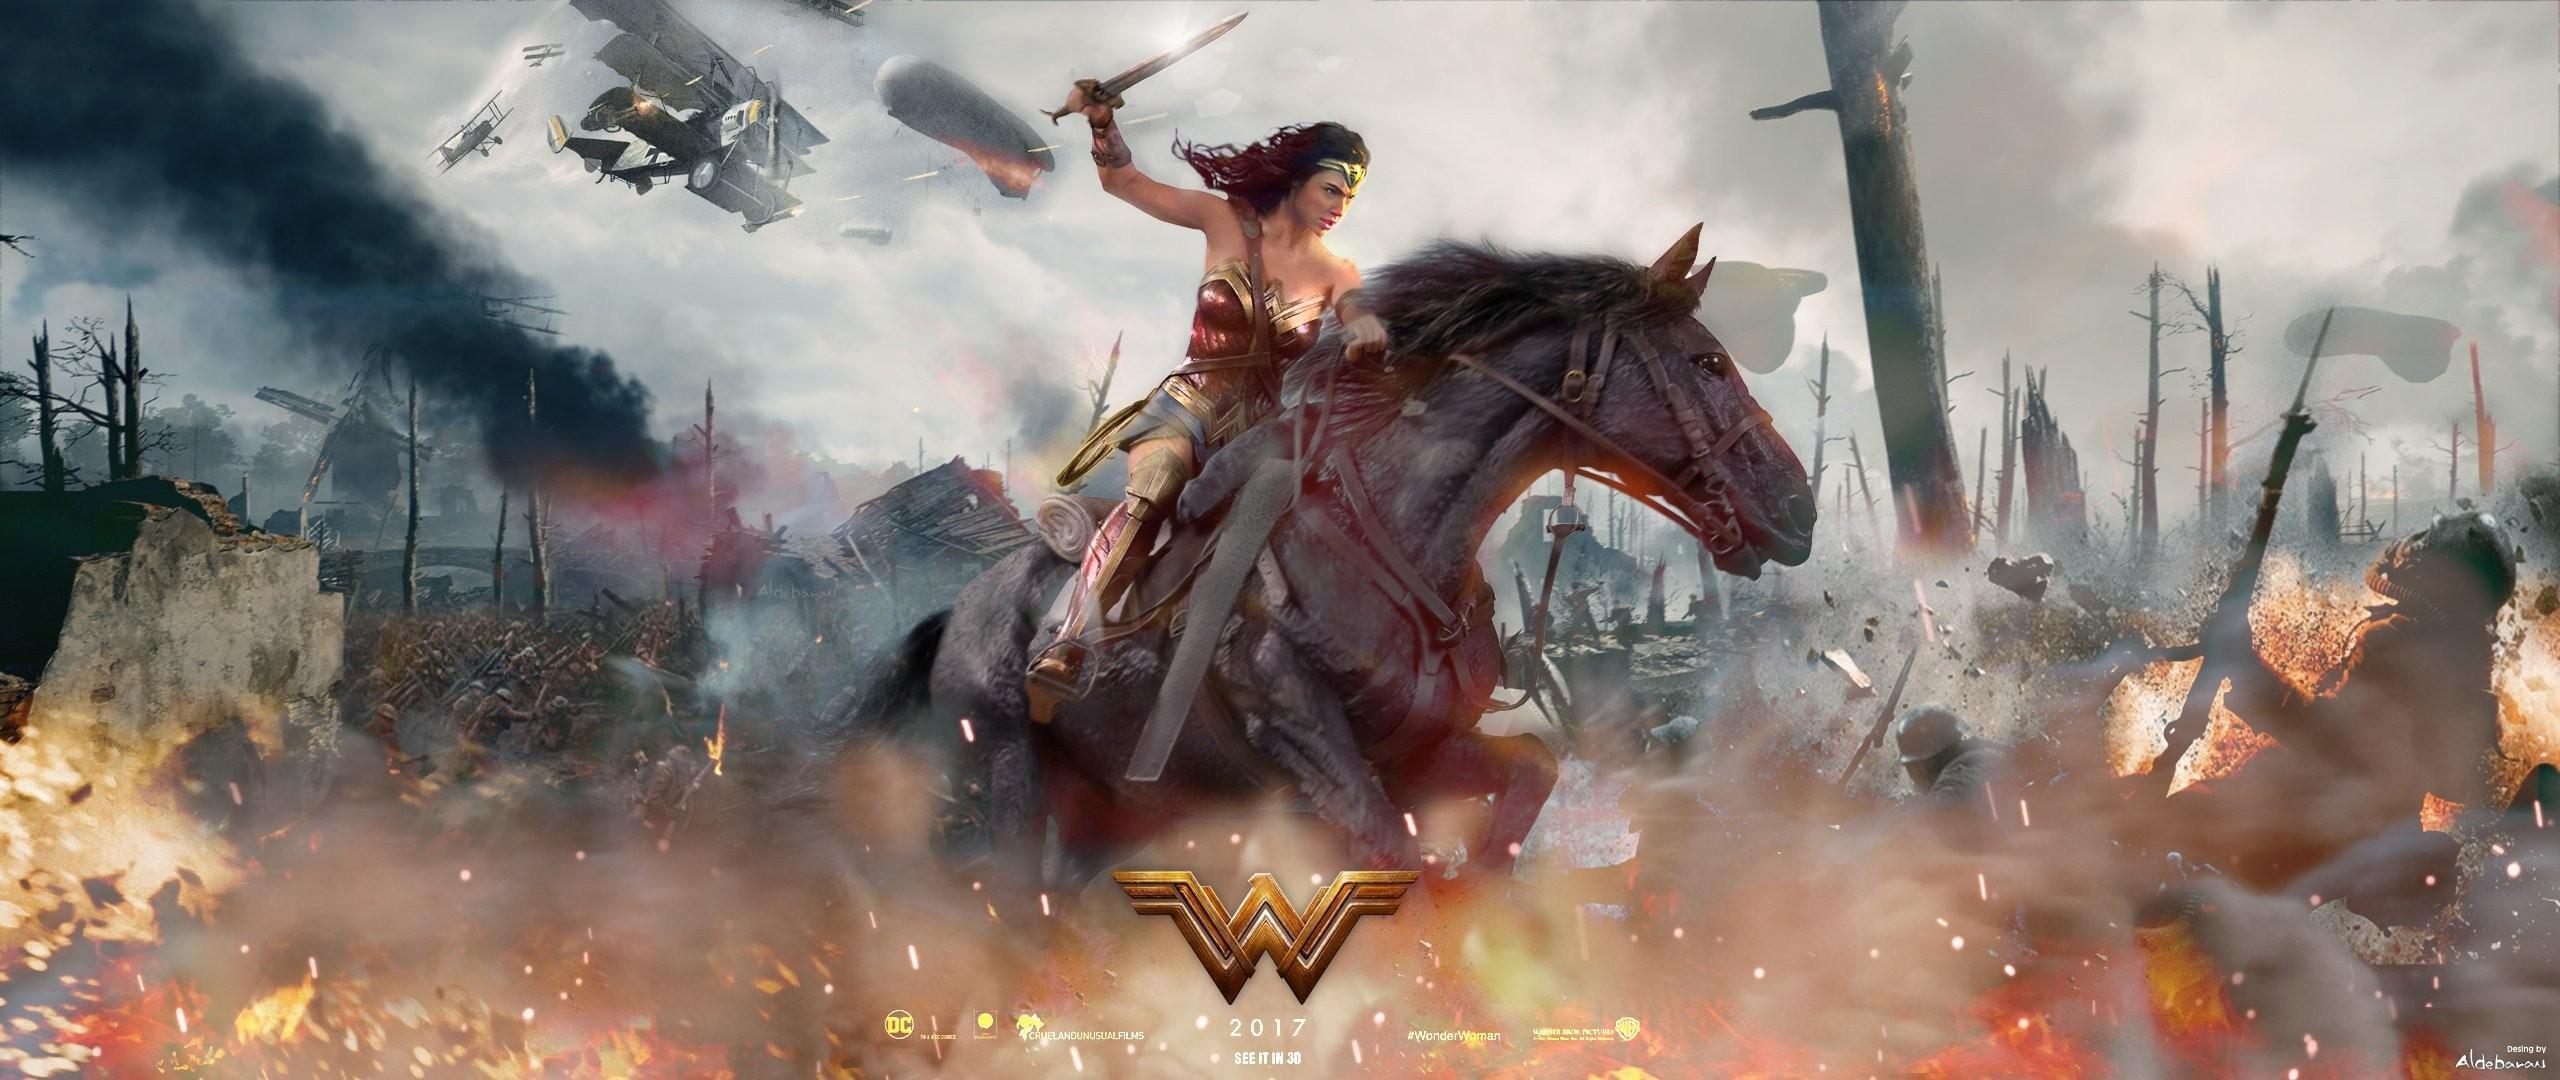 Wonder Woman Wallpapers